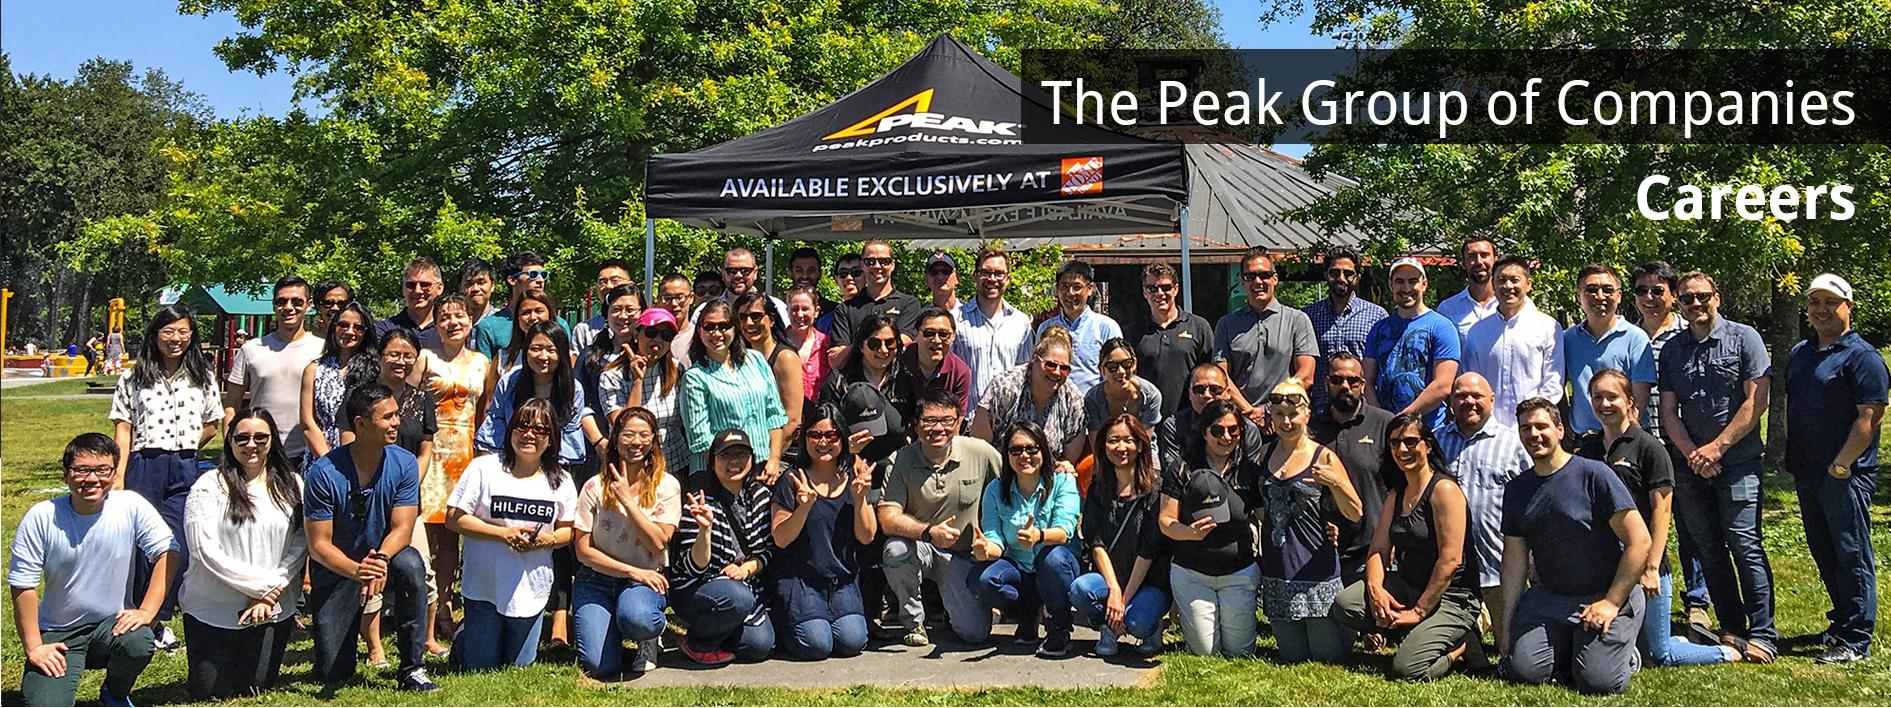 Careers at The Peak Group of Companies